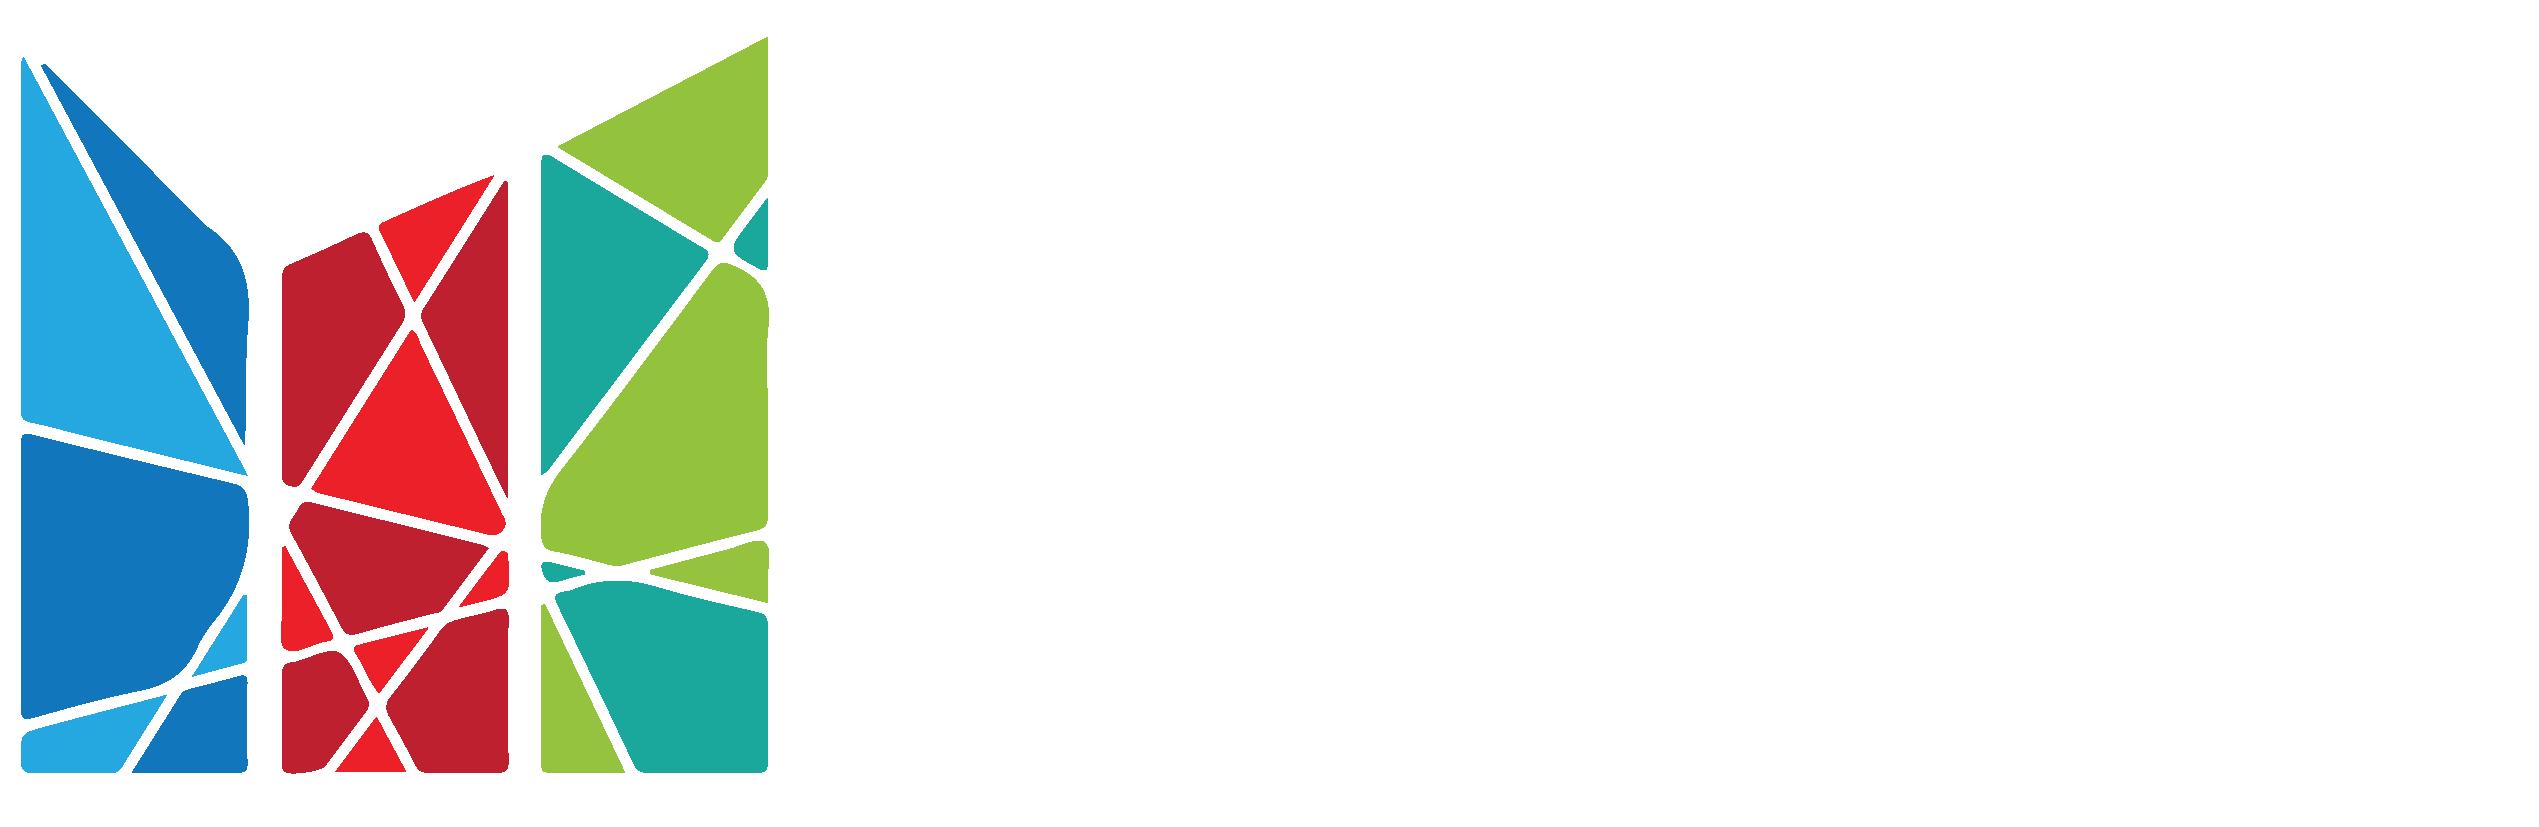 MK-group-logo-1